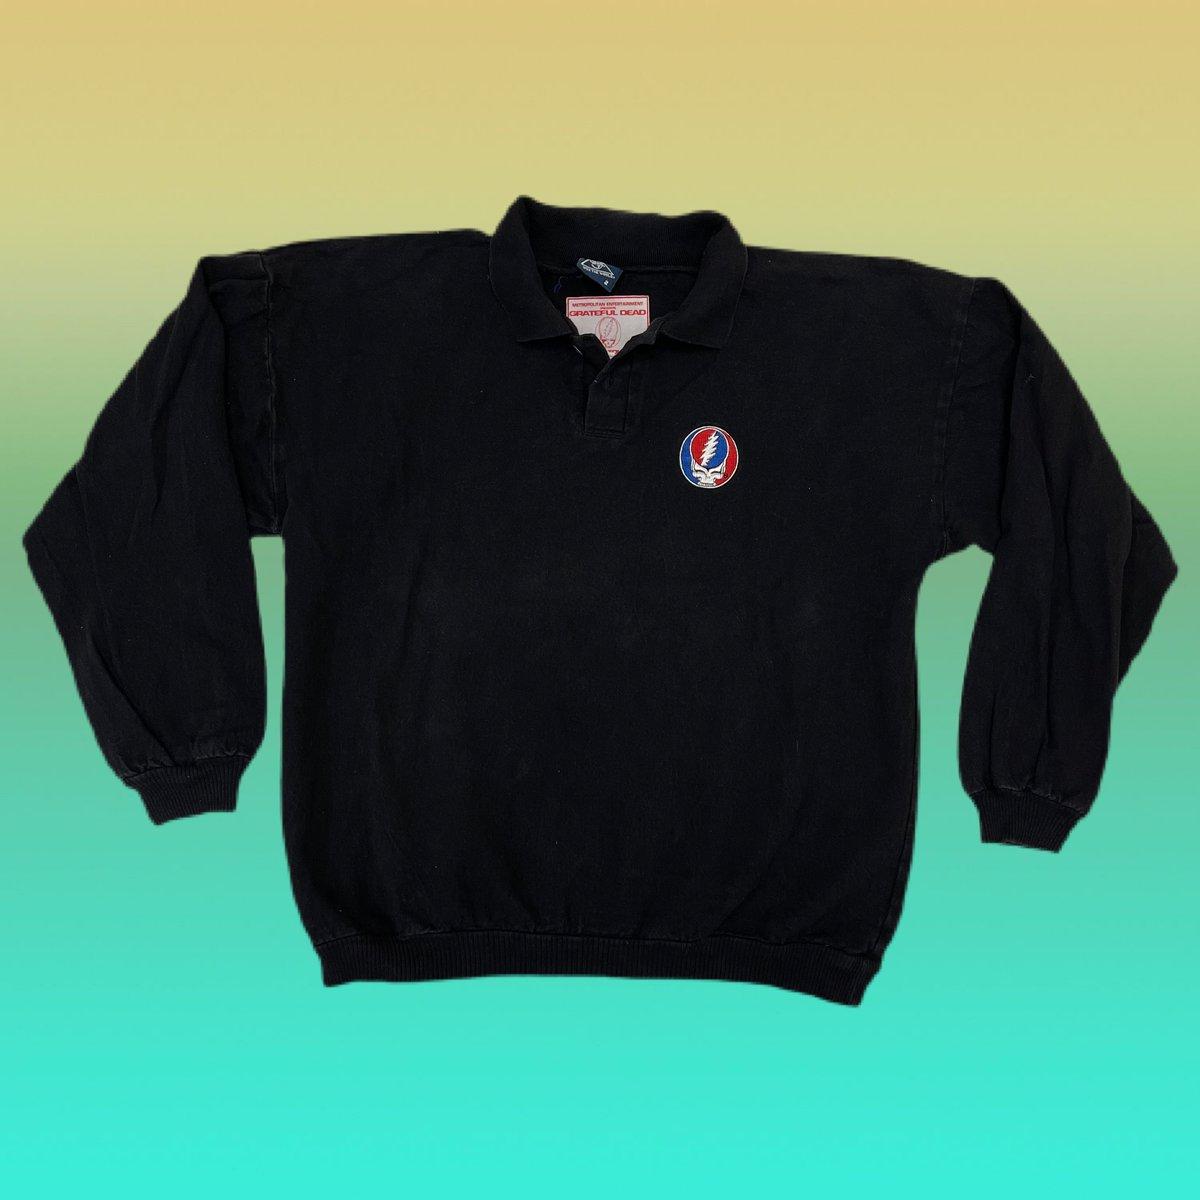 Original Vintage Grateful Dead Road Crew 1993 Long Sleeve Polo Shirt! X-LARGE!